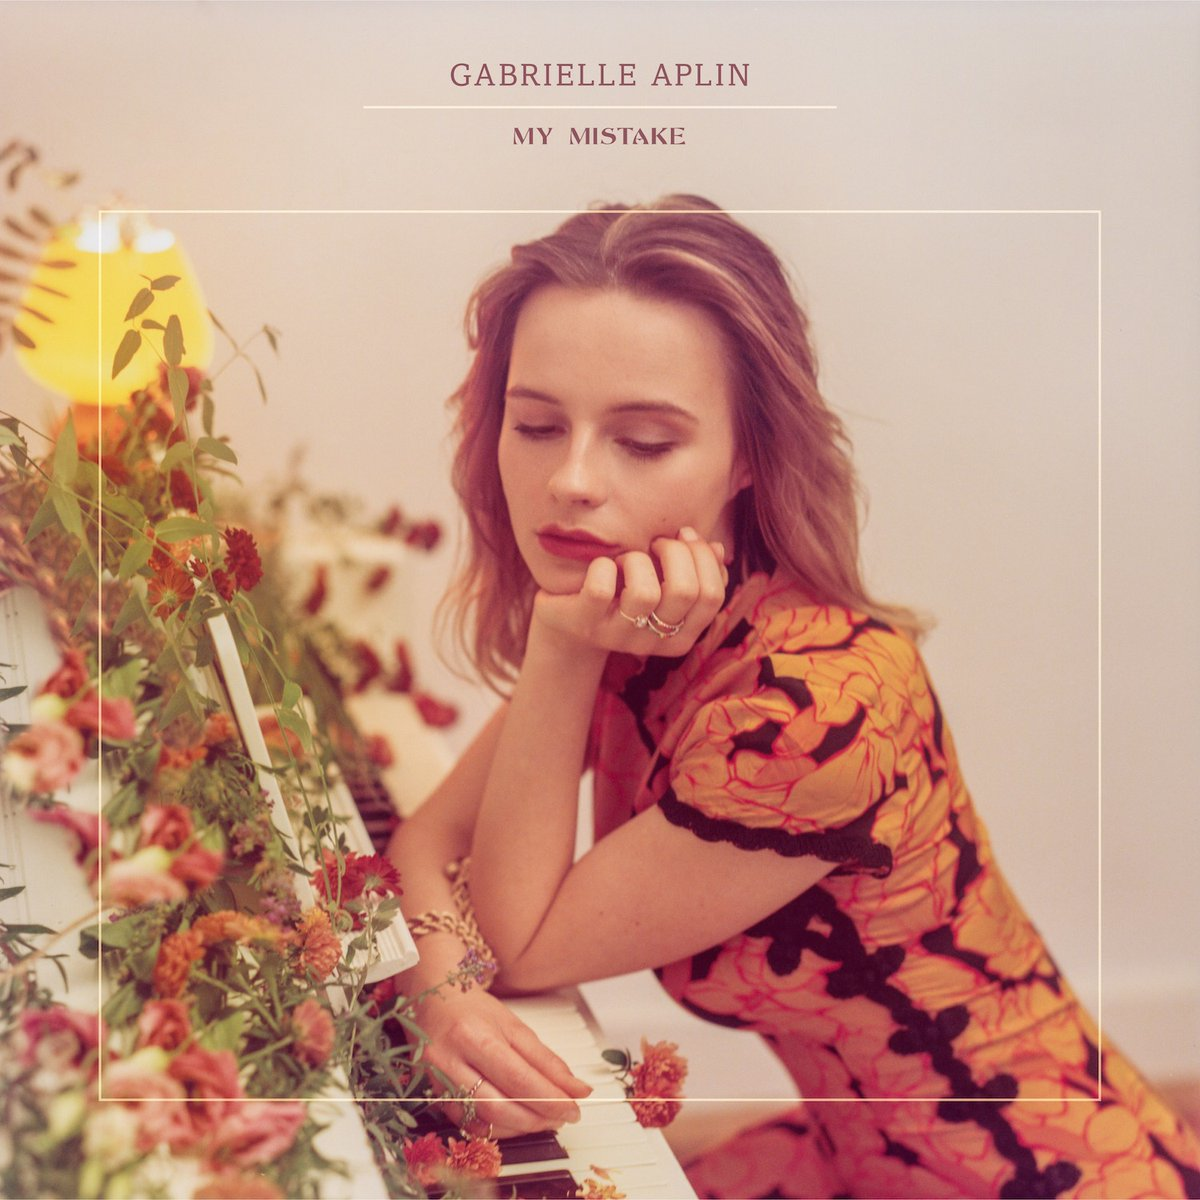 Aplin - [10's] Gabrielle Aplin - My Mistake (2018) Gabrielle%20Aplin%20-%20My%20Mistake